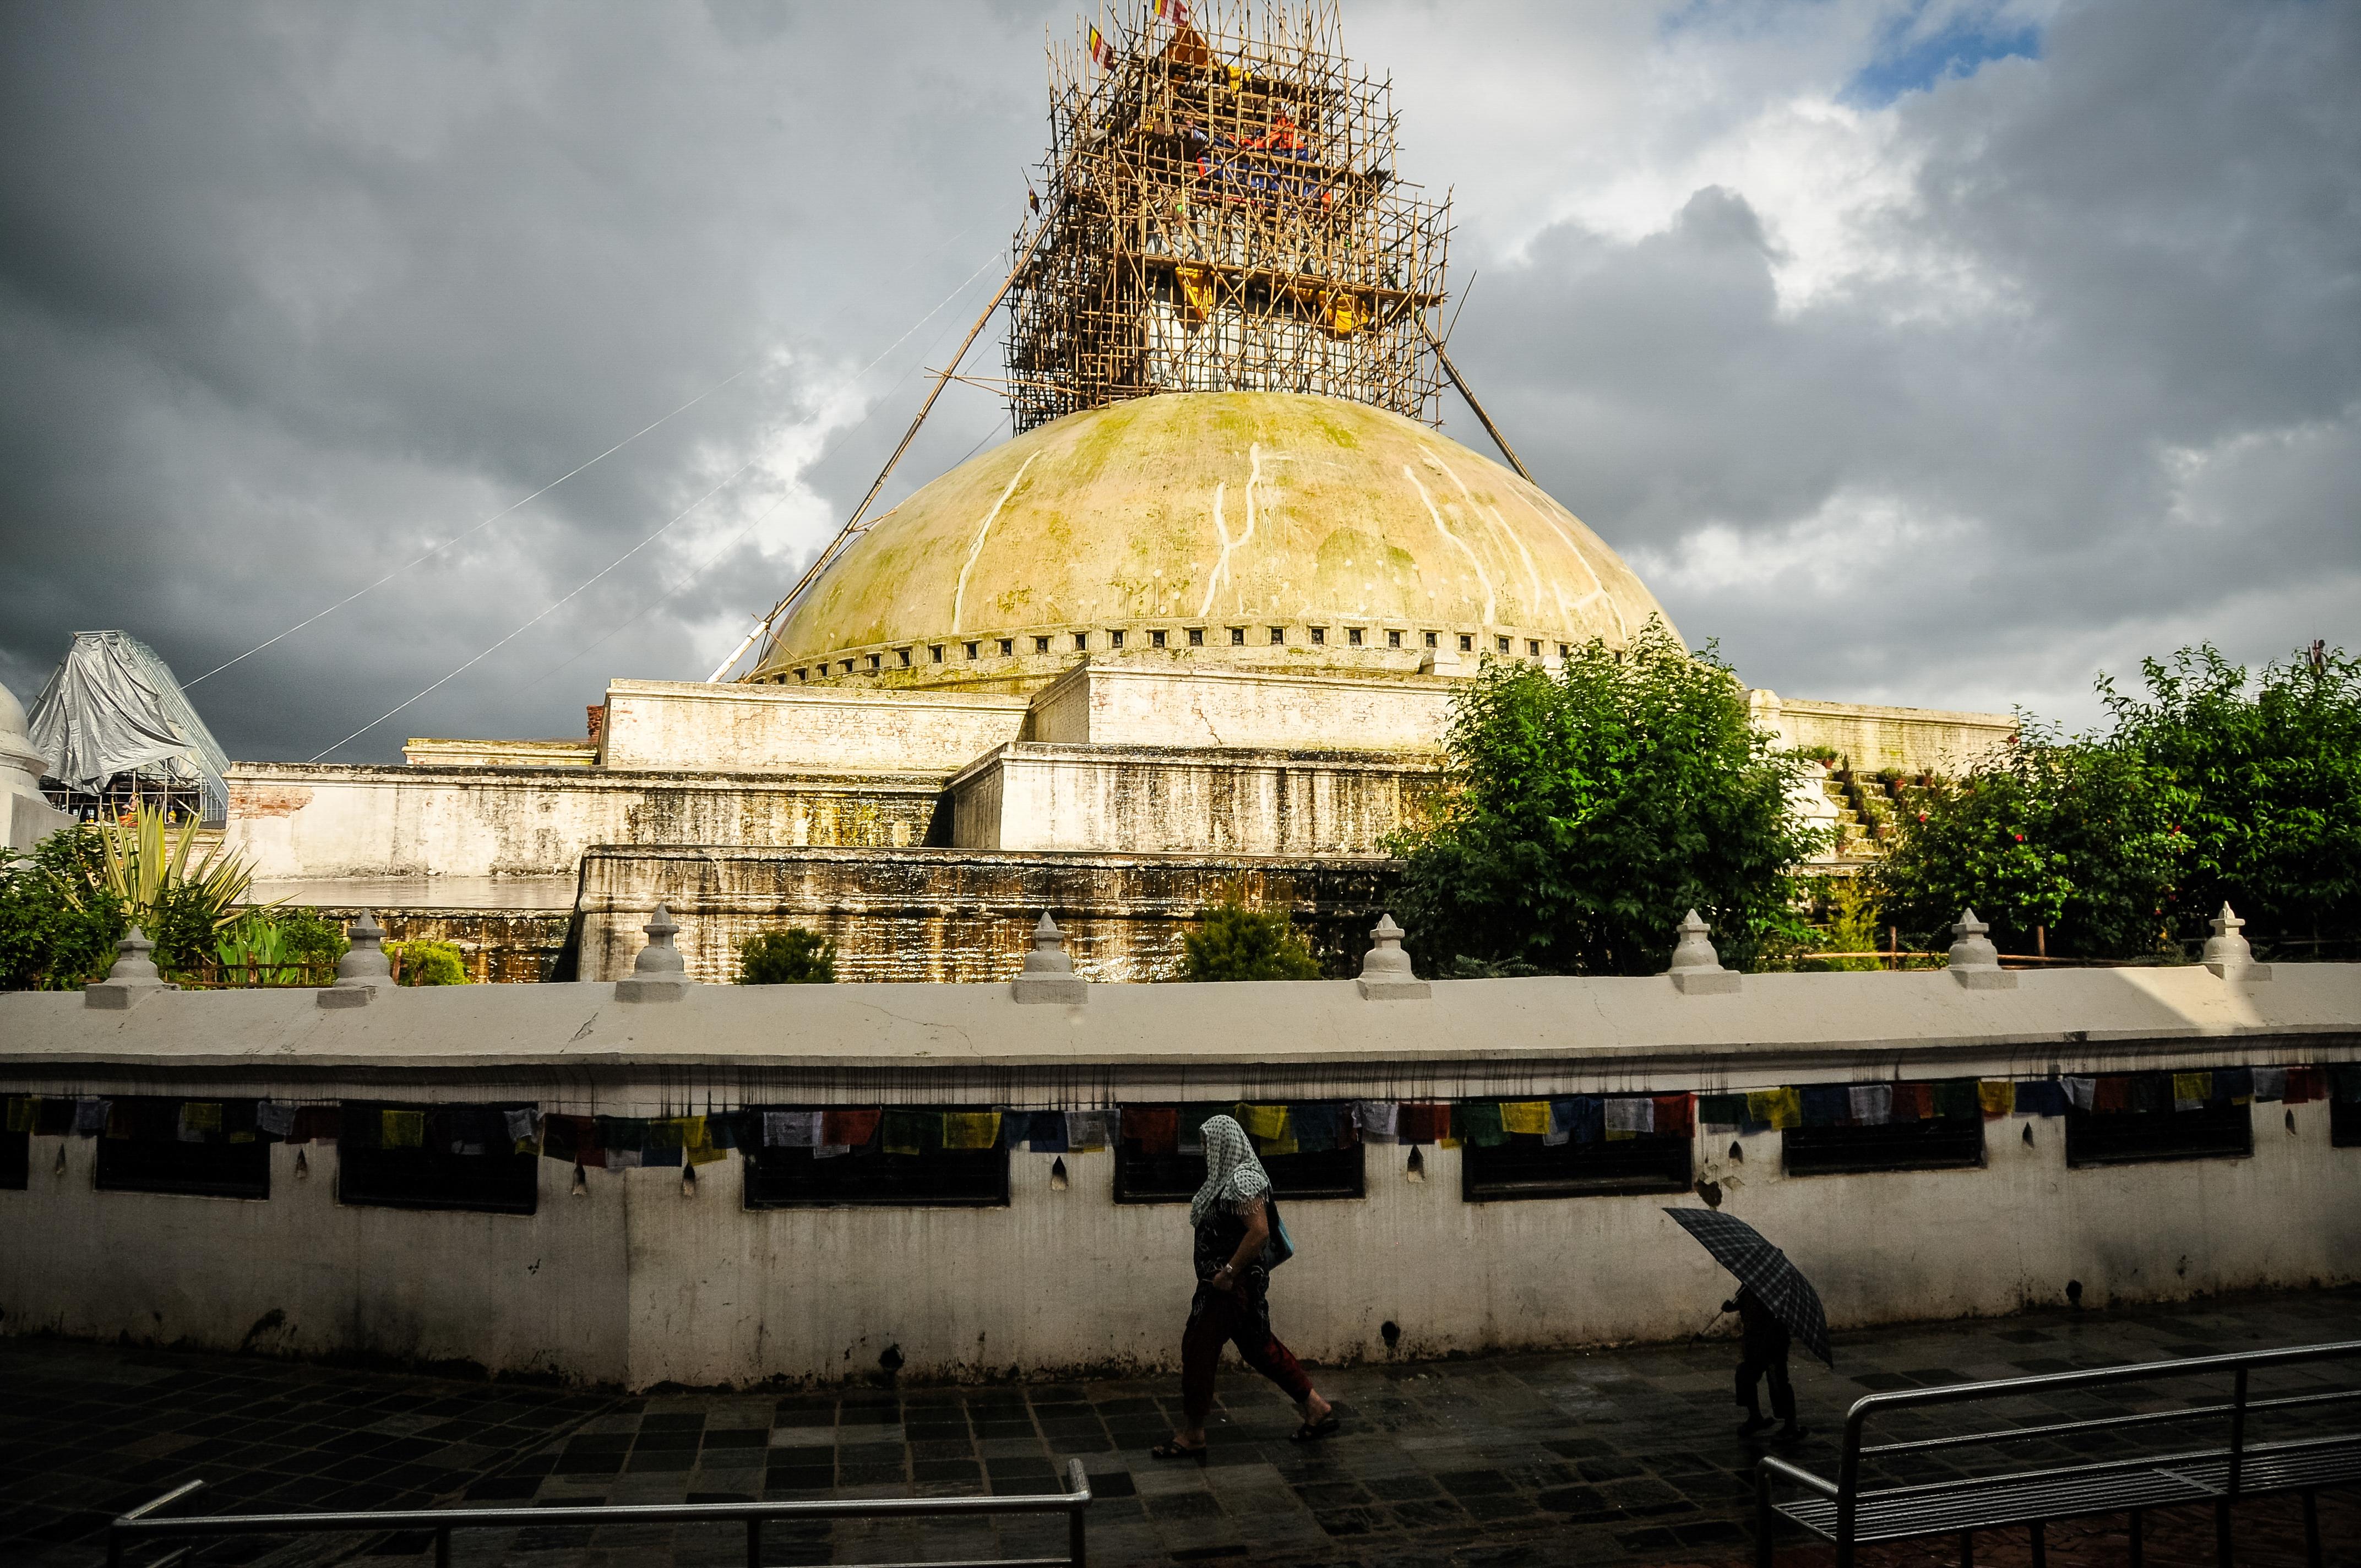 Boudhanath Stupa following late afternoon rain - Boudhanath, Kathmandu.